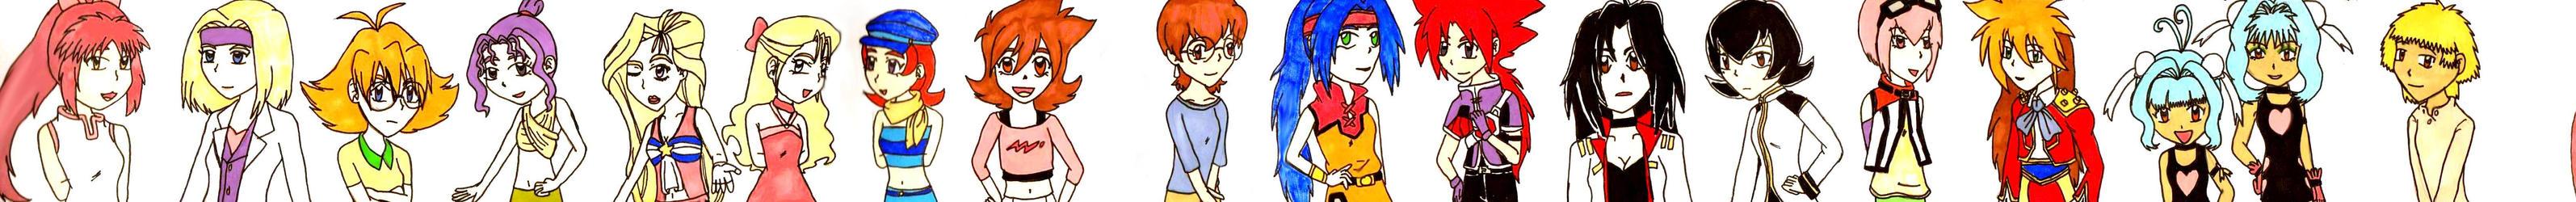 Original Beyblade Girls by MajesticIllusion